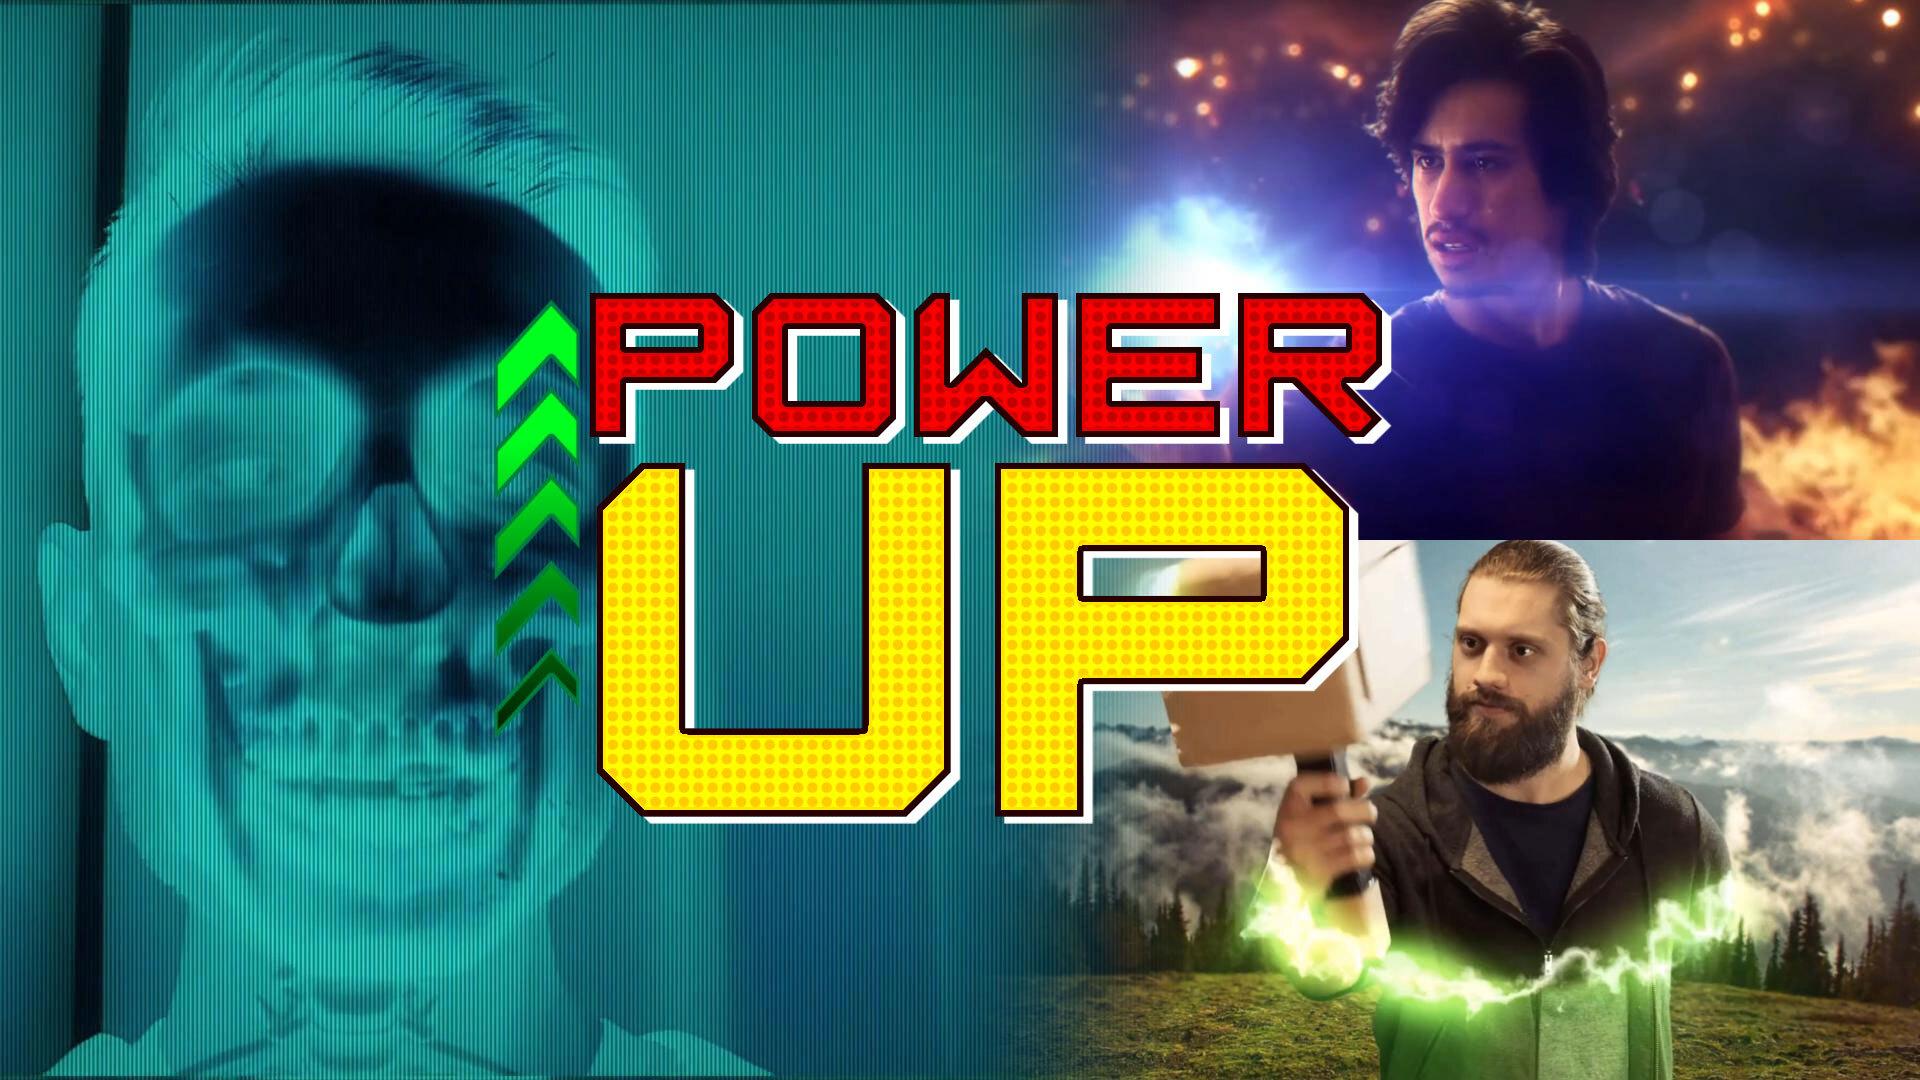 Power Up - VFX masterclass thumbnail, X-ray effects, Loki transformation, Thor's hammer and magic energy ball VFX